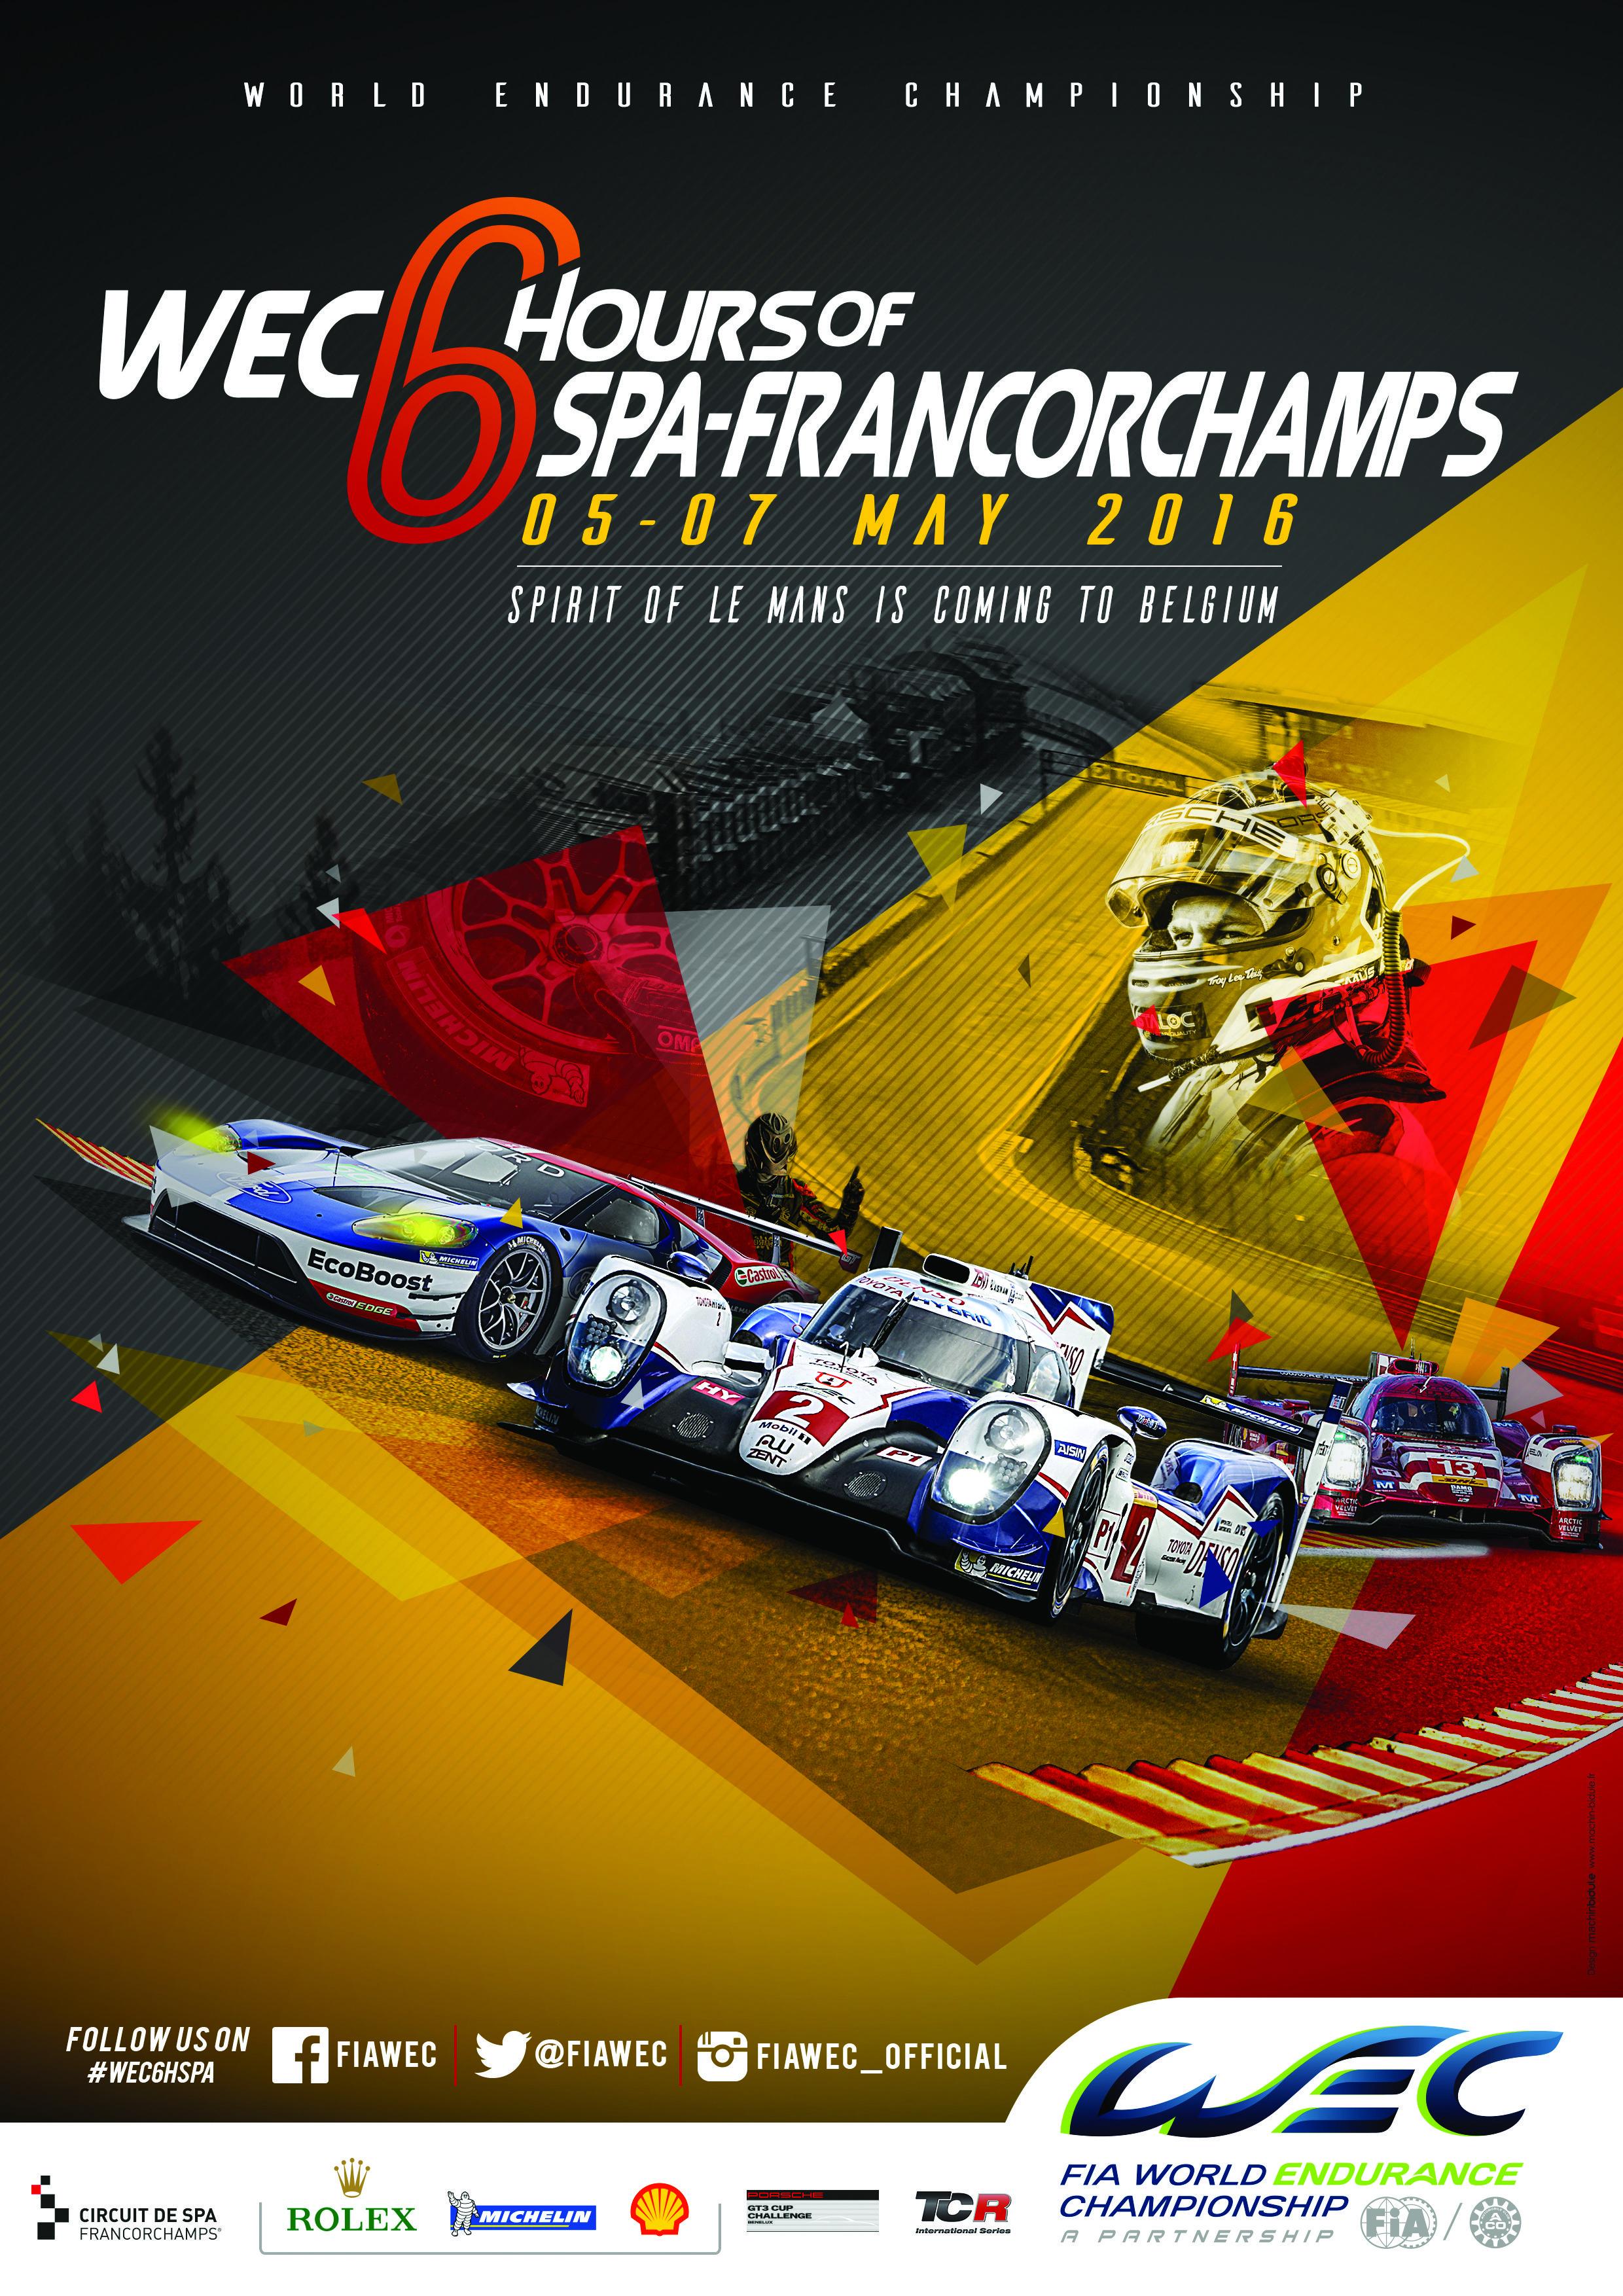 Calendar Fia World Endurance Championship Motorsport Art Event Poster Racing Posters